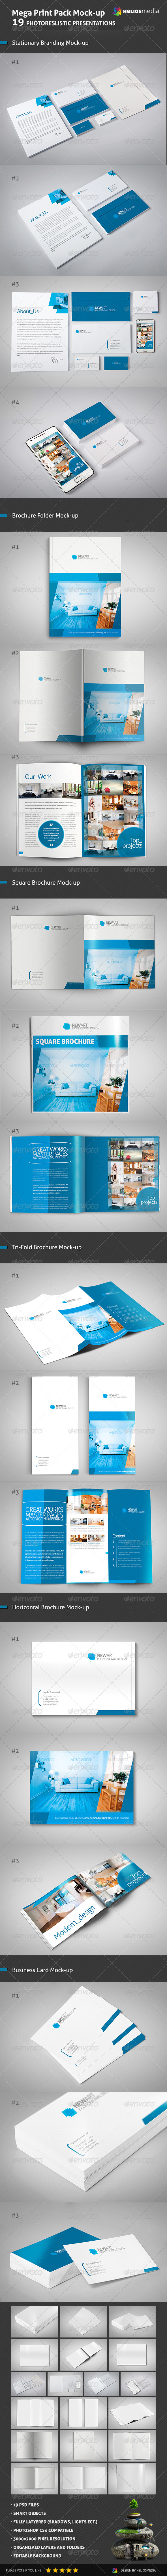 Branding / Identity Mockup 3 - Print Product Mock-Ups